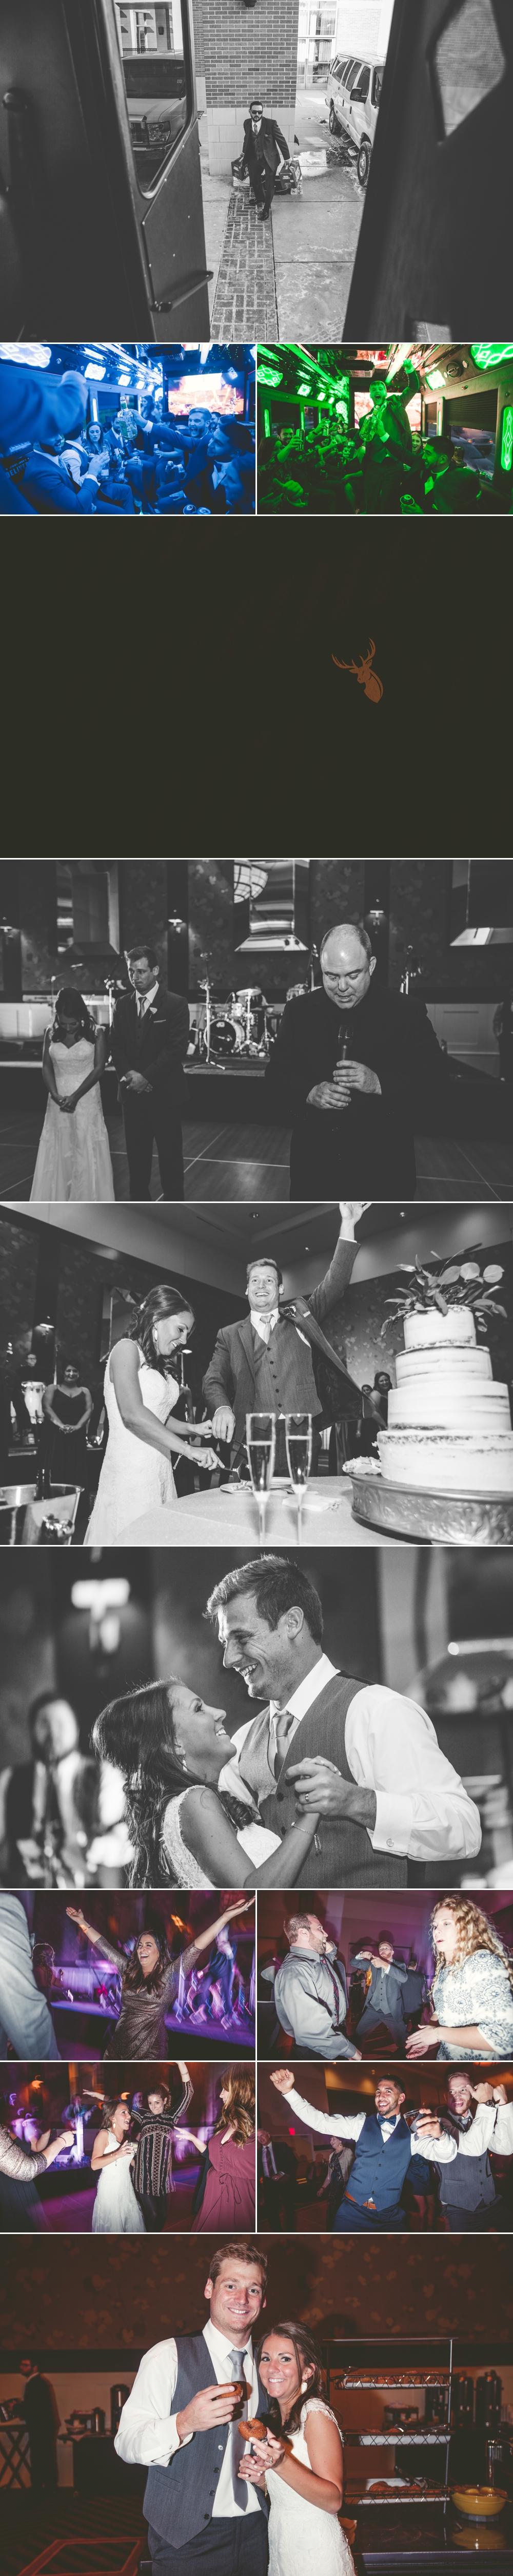 jason_domingues_photography_best_kansas_city_photographer_kc_wedding_weddings_winter0003.jpg